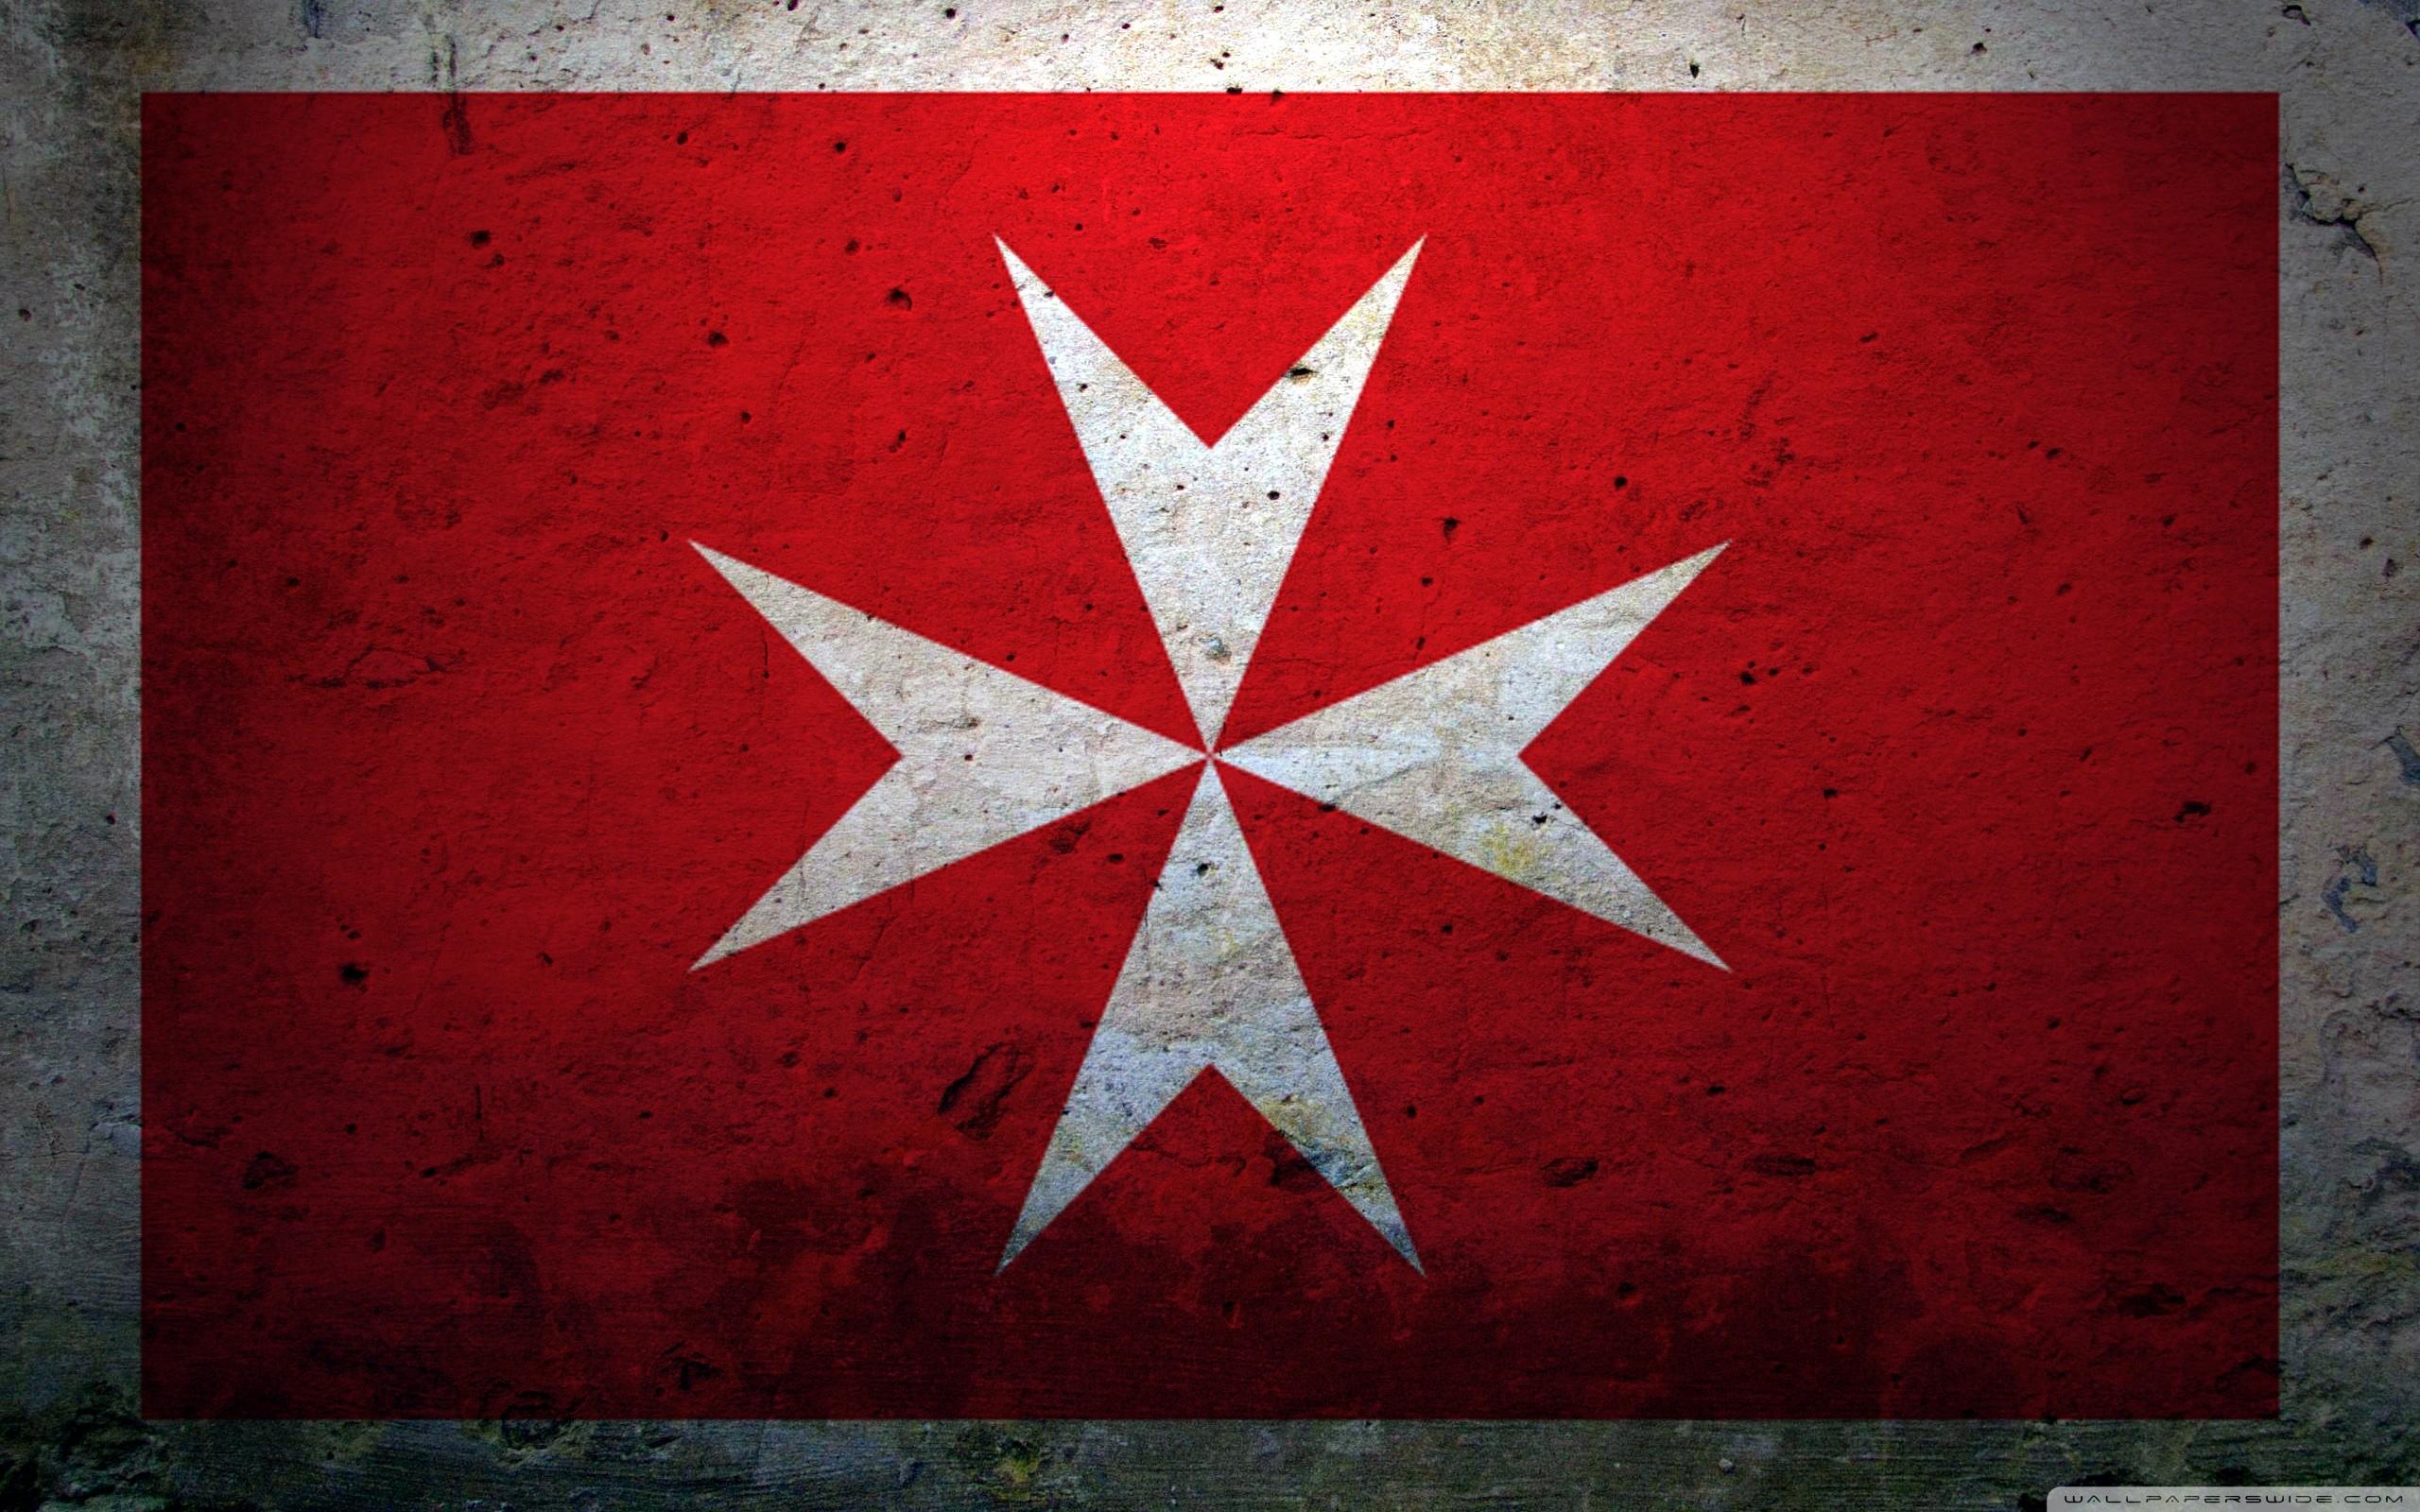 Knights Templar Wallpaper Iphone Maltese Cross Wallpaper 56 Images